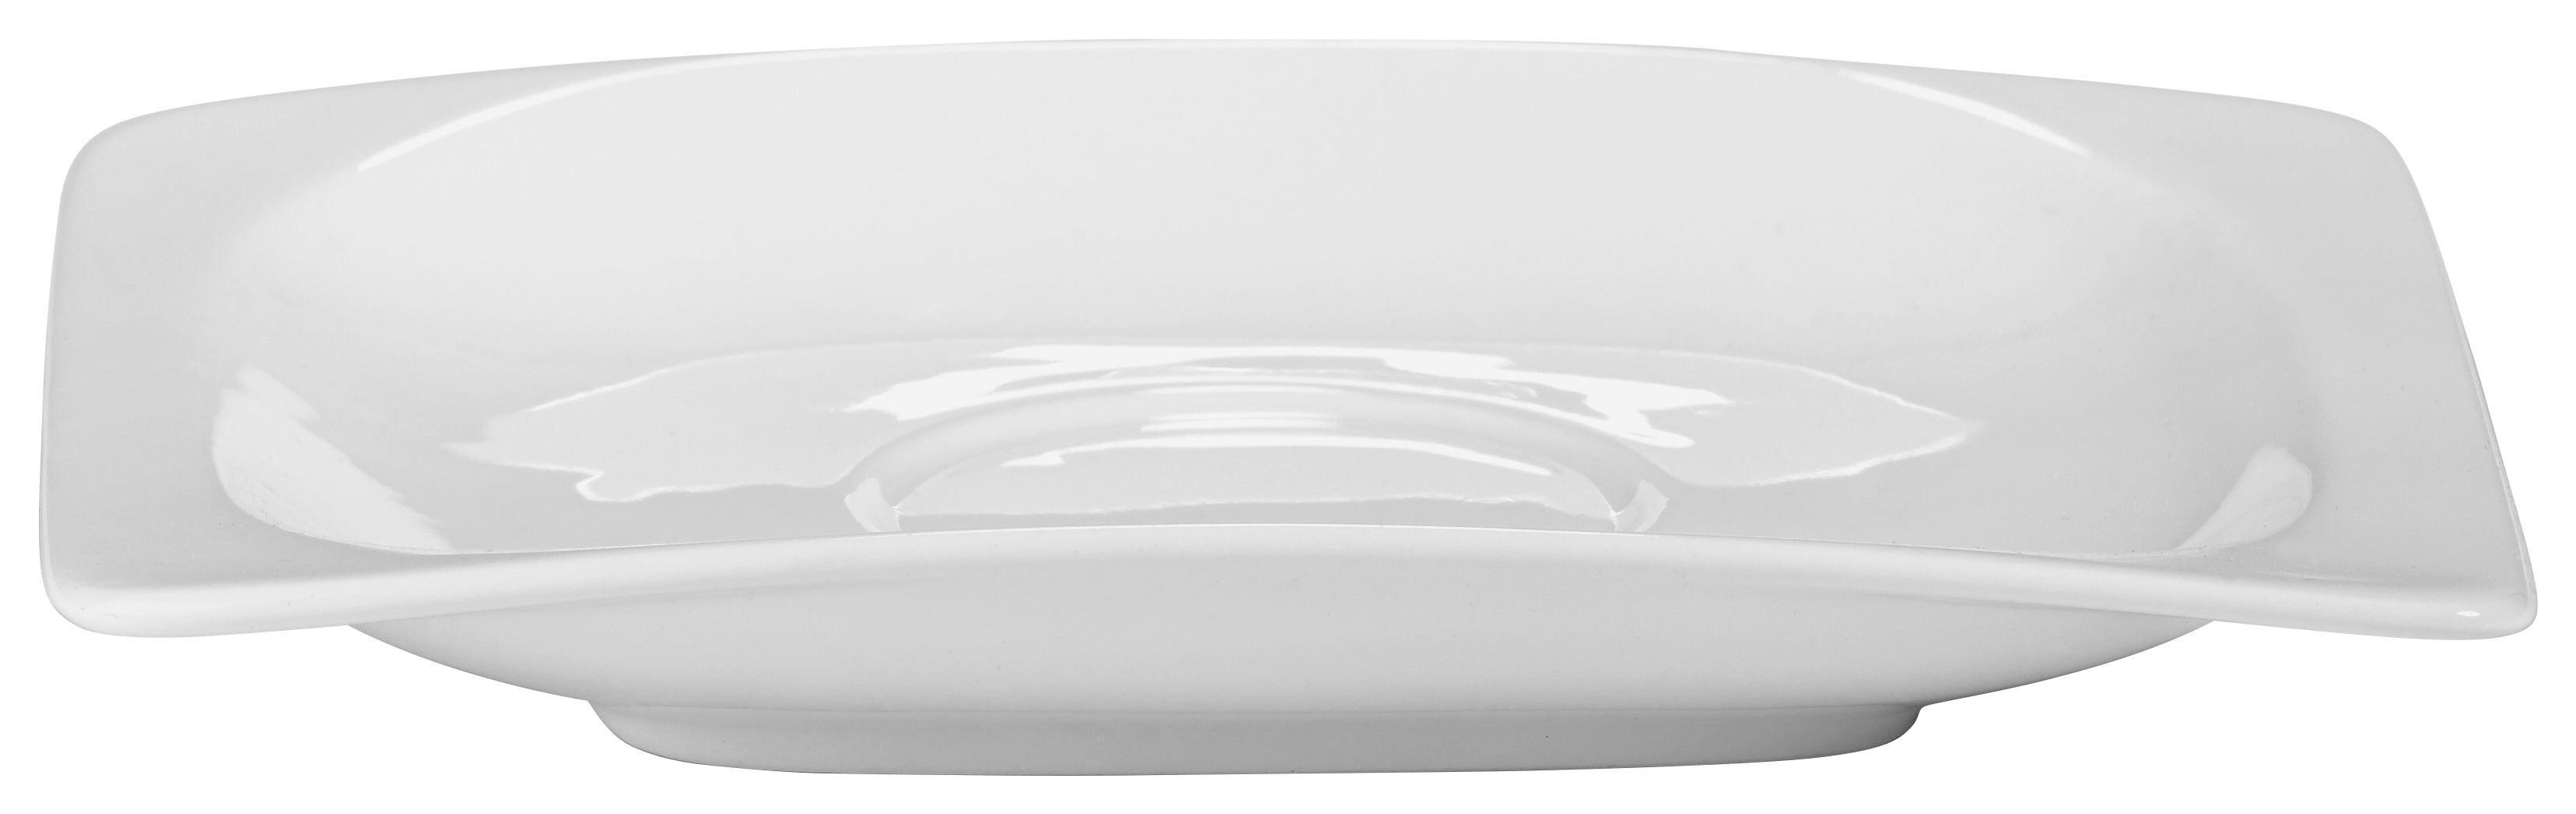 KROŽNIČEK - bela, Basics, keramika (12/16/2cm) - RITZENHOFF BREKER